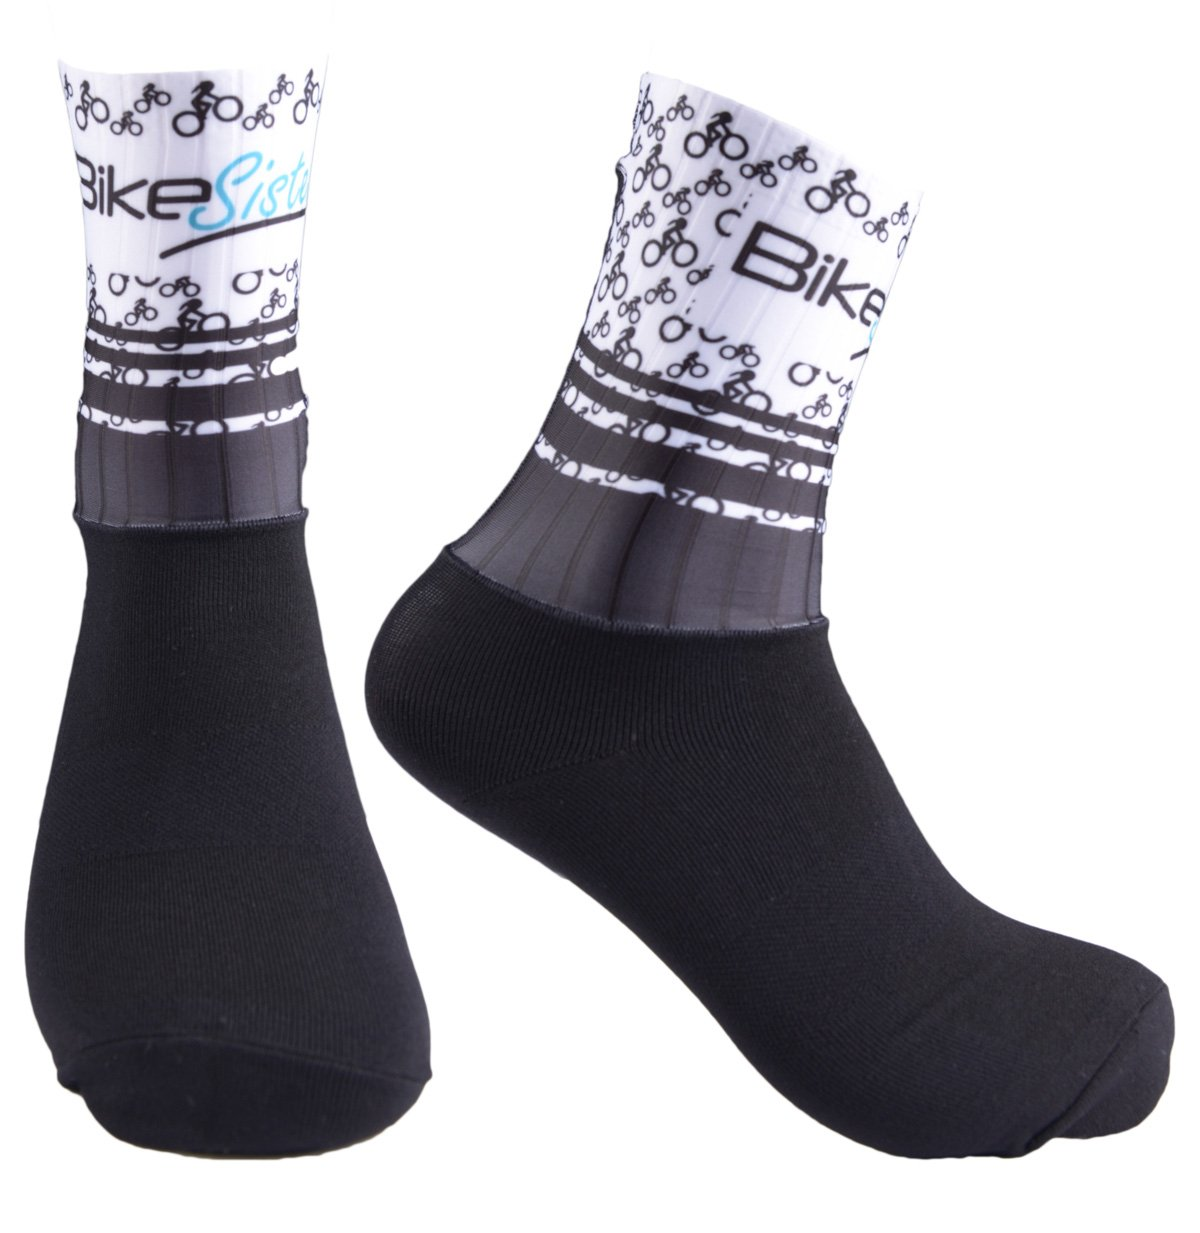 BikeSister Team strømper | Socks